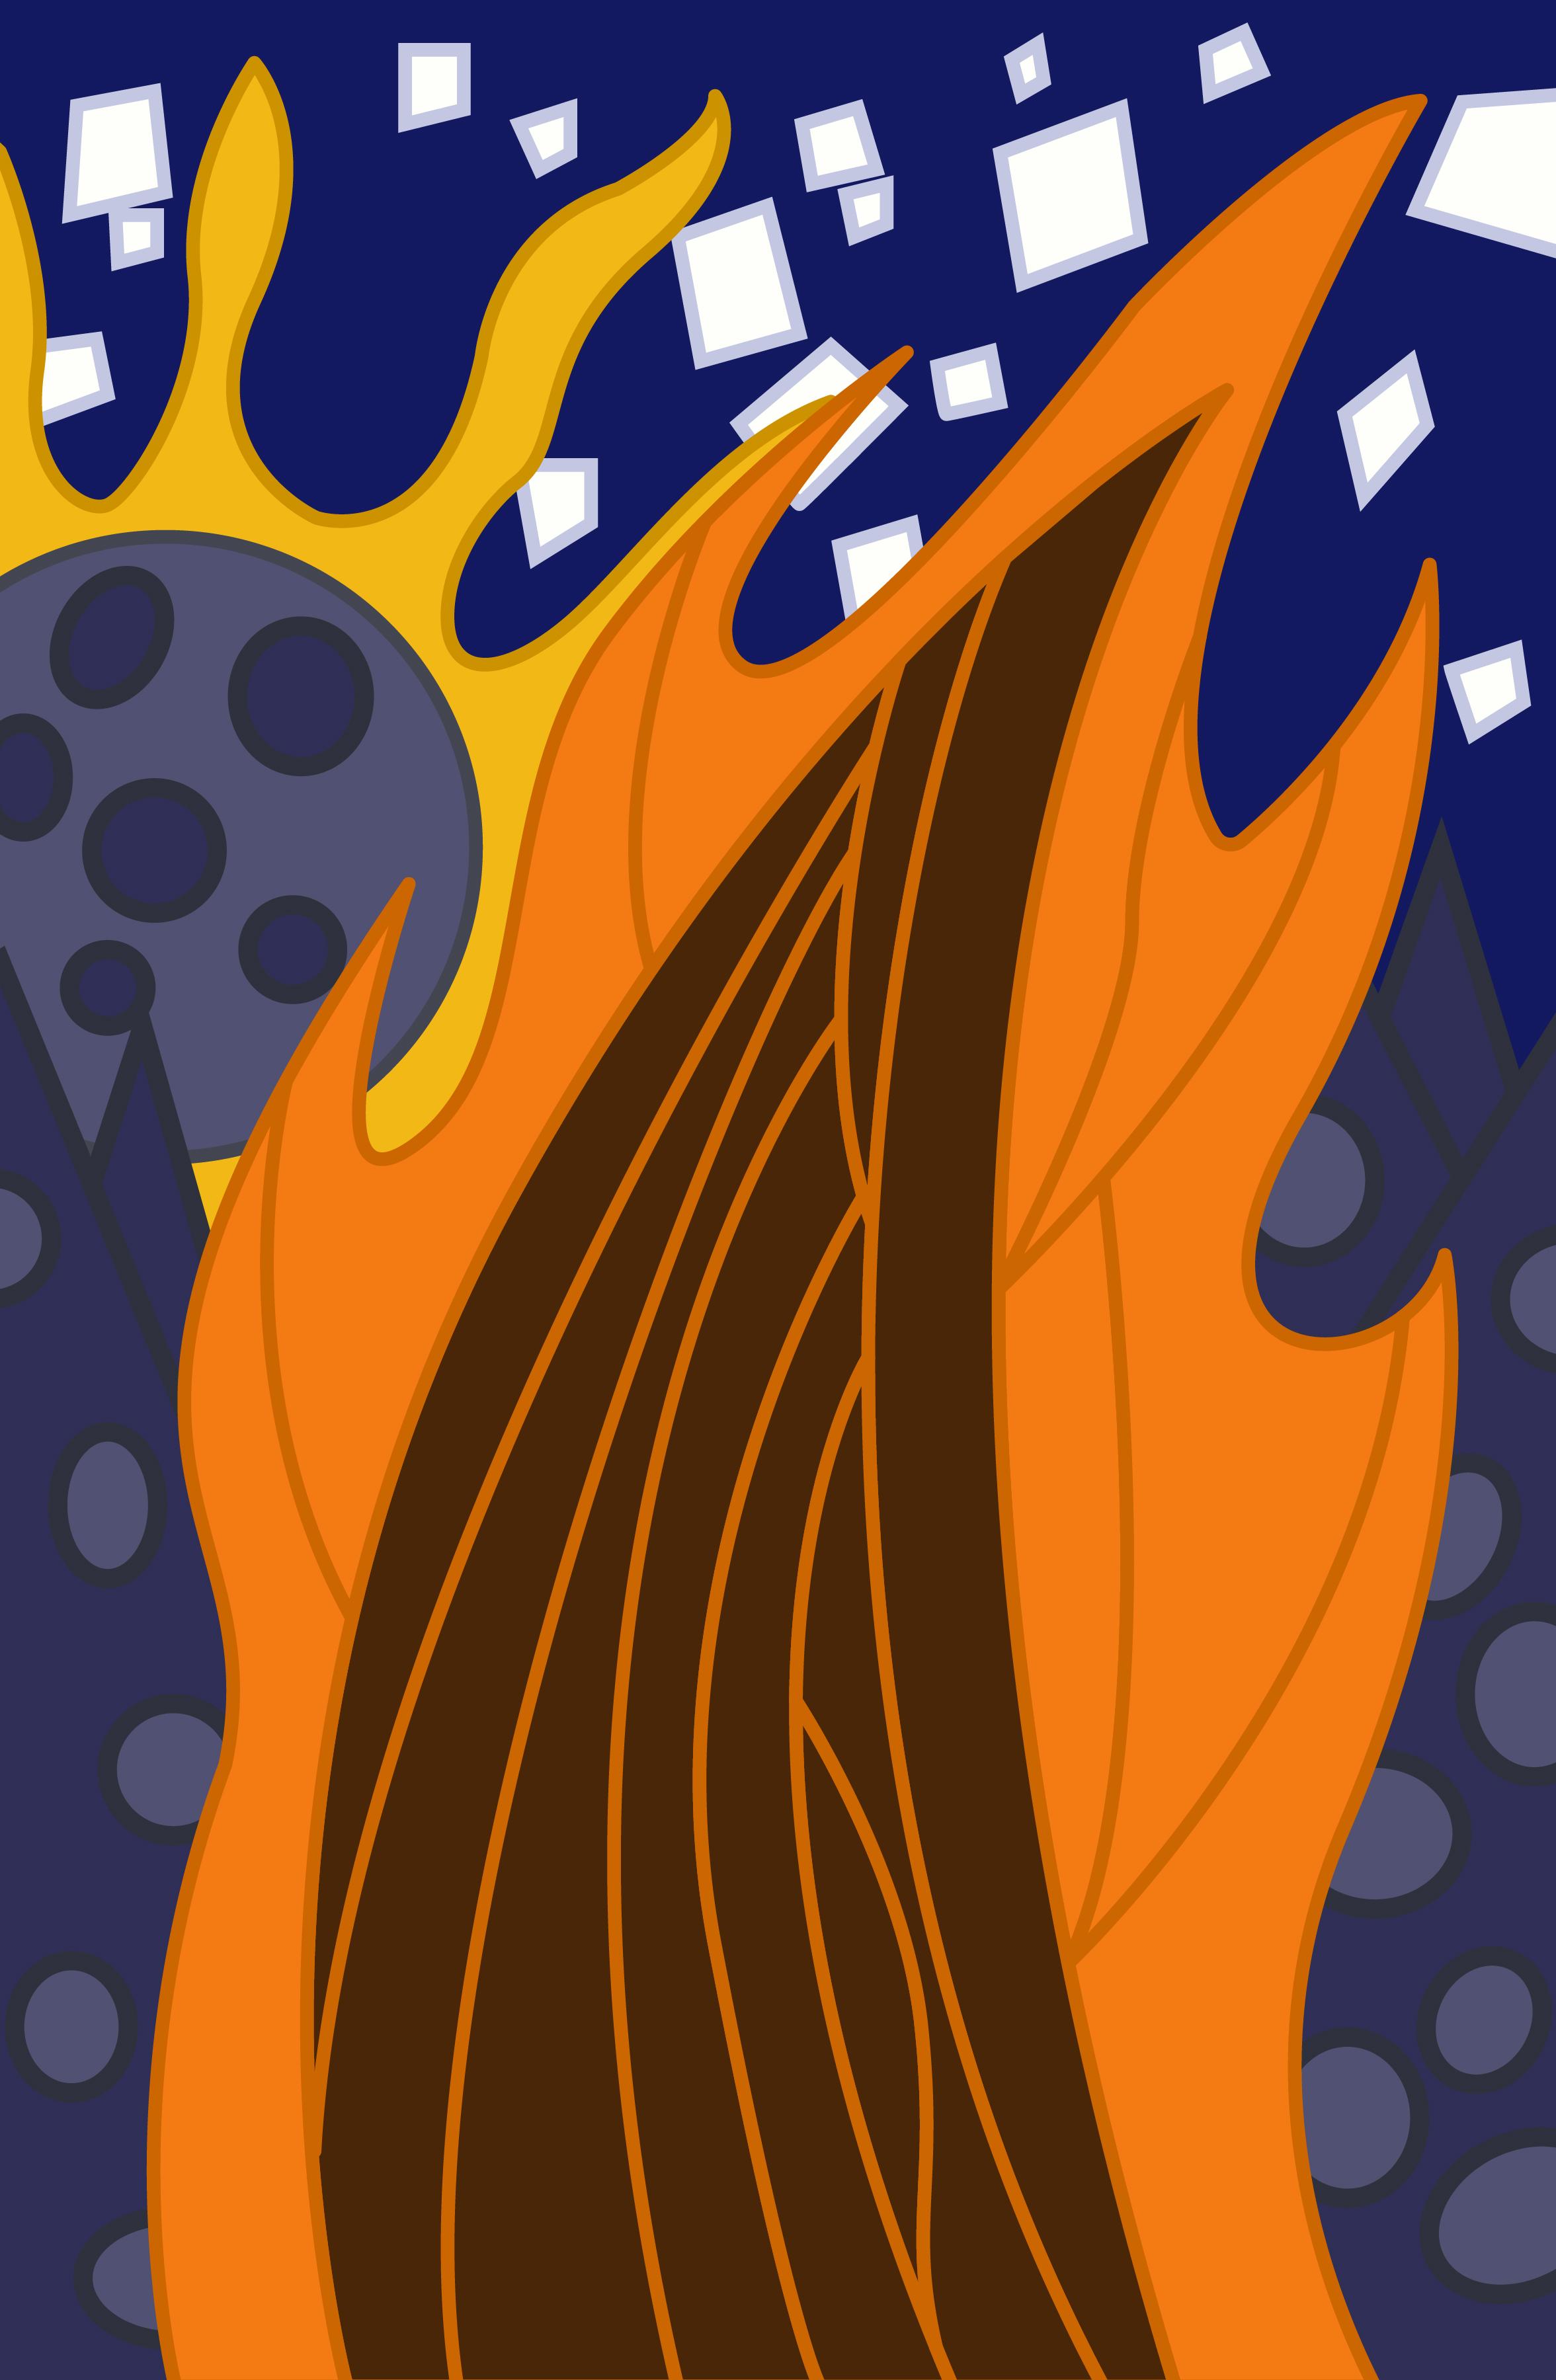 Bonfire-01.jpg